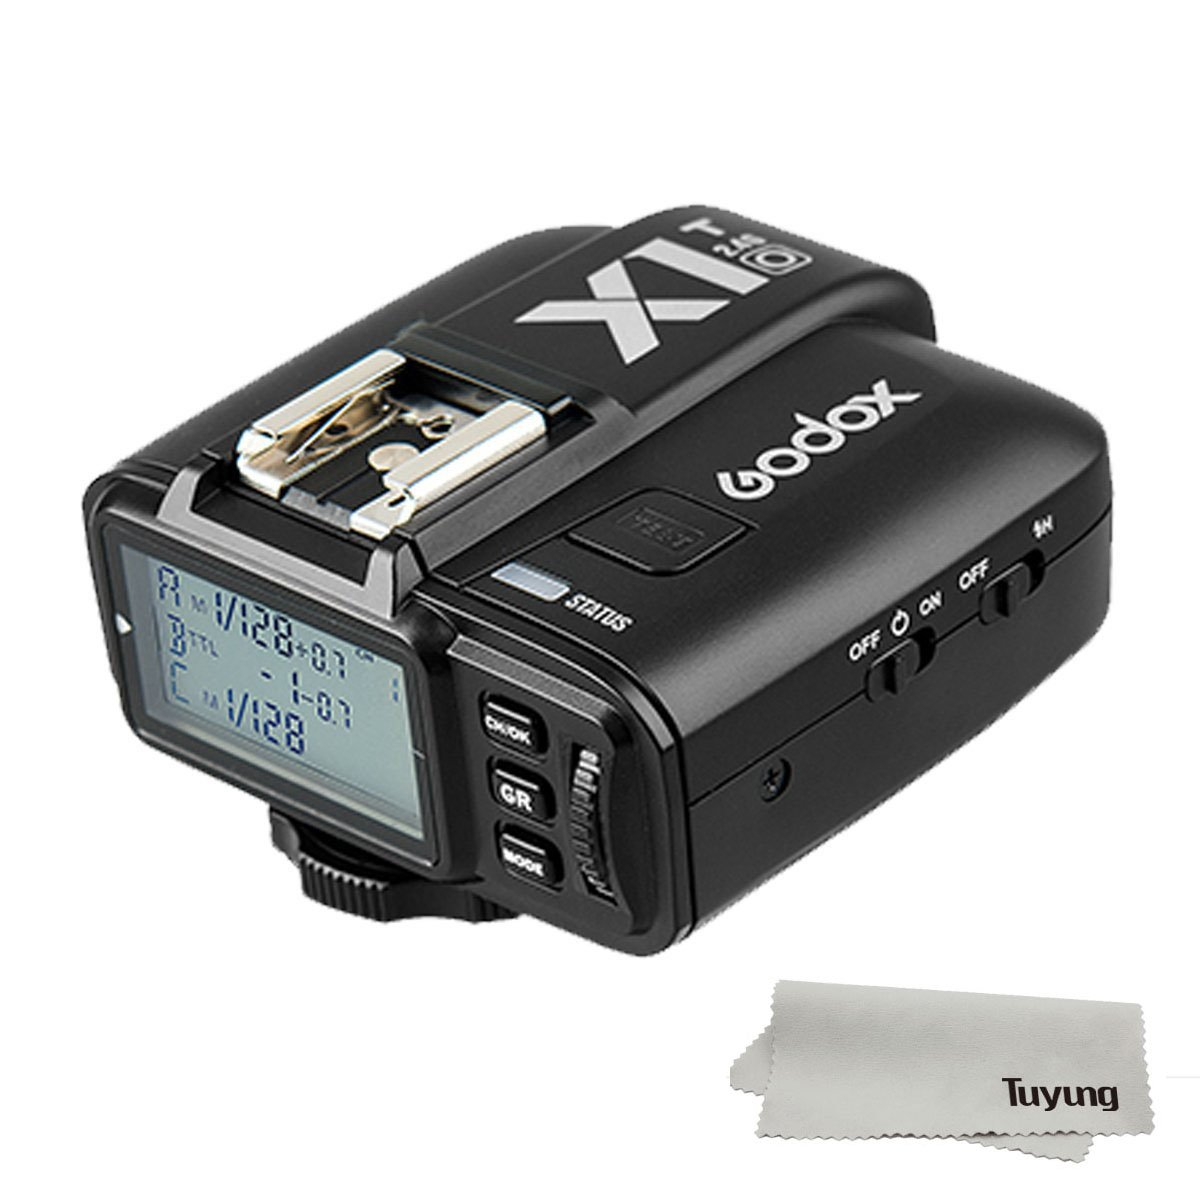 GODOX X1T-O TTL Strobe Trigger 1/8000s HSS 32 Channels 2.4G Wireless LCD Flash Trigger Transmitter for Olympus Panasonic